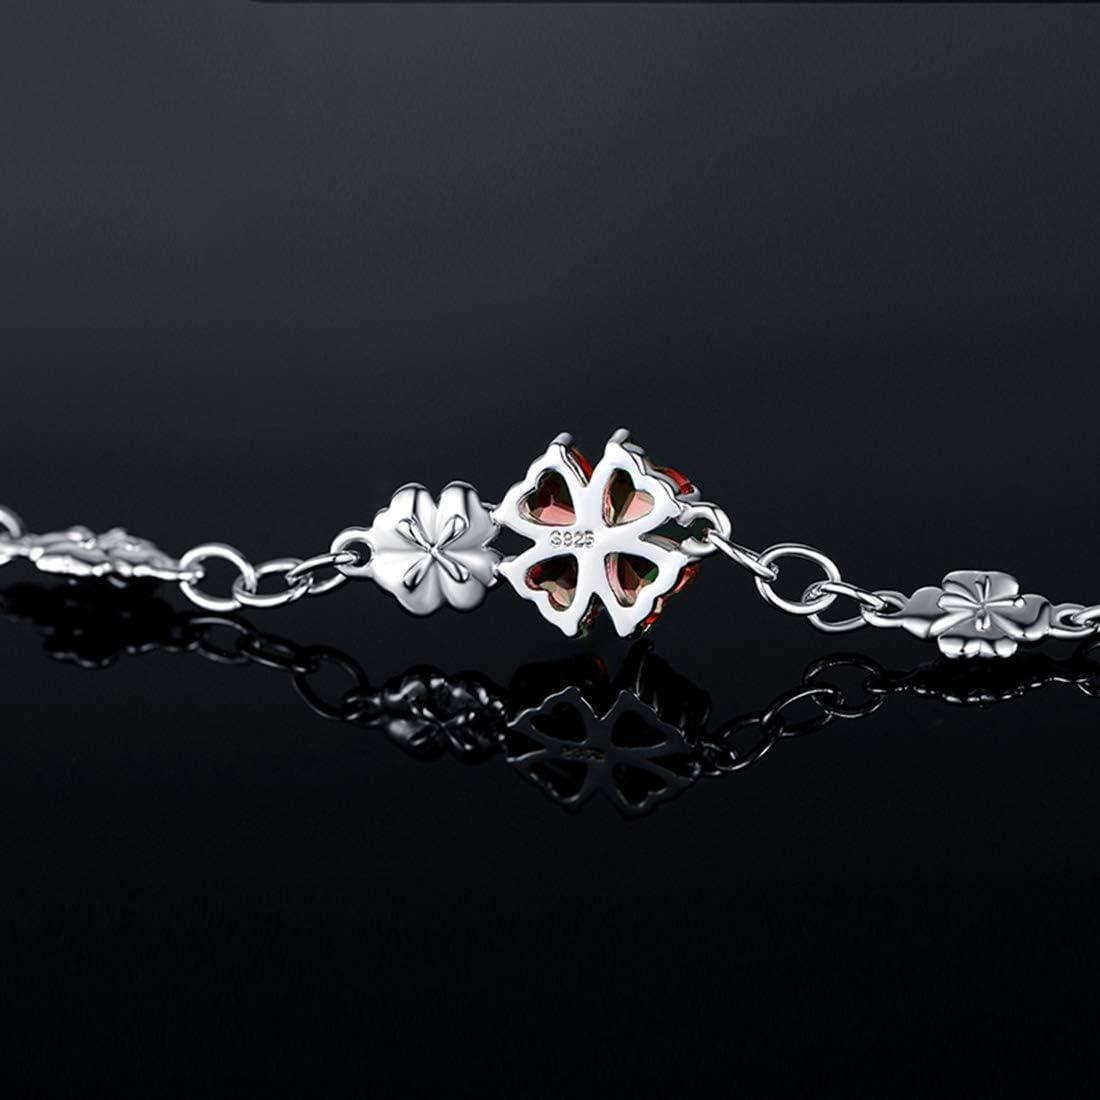 JIANGXIN 925 Sterling Silver Birthstone Chain Link Bracelet for Women Girl Lucky Four leaf clover Gemstone Fine Jewelry Good Luck Shamrock Birthday Gift